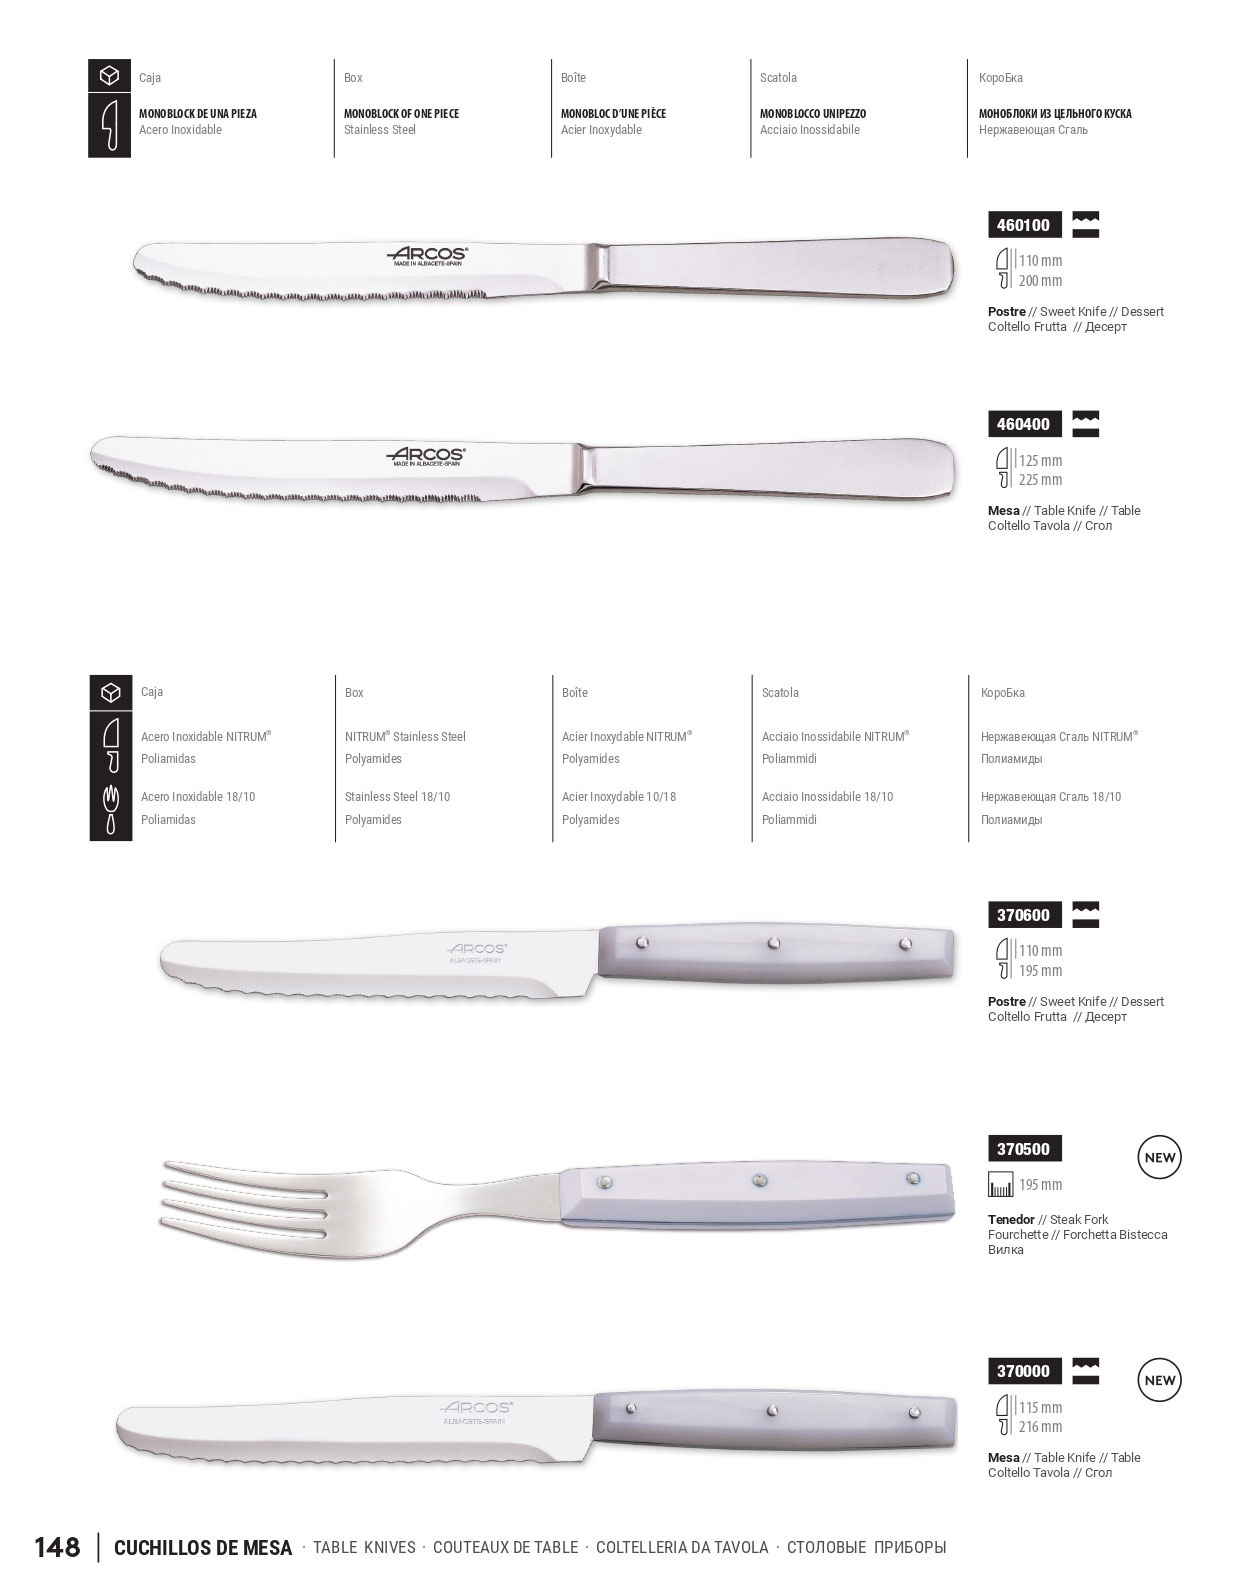 805109 cuchillos de mesa arcos menaje cocina cubiertos for Clases de cuchillos de mesa